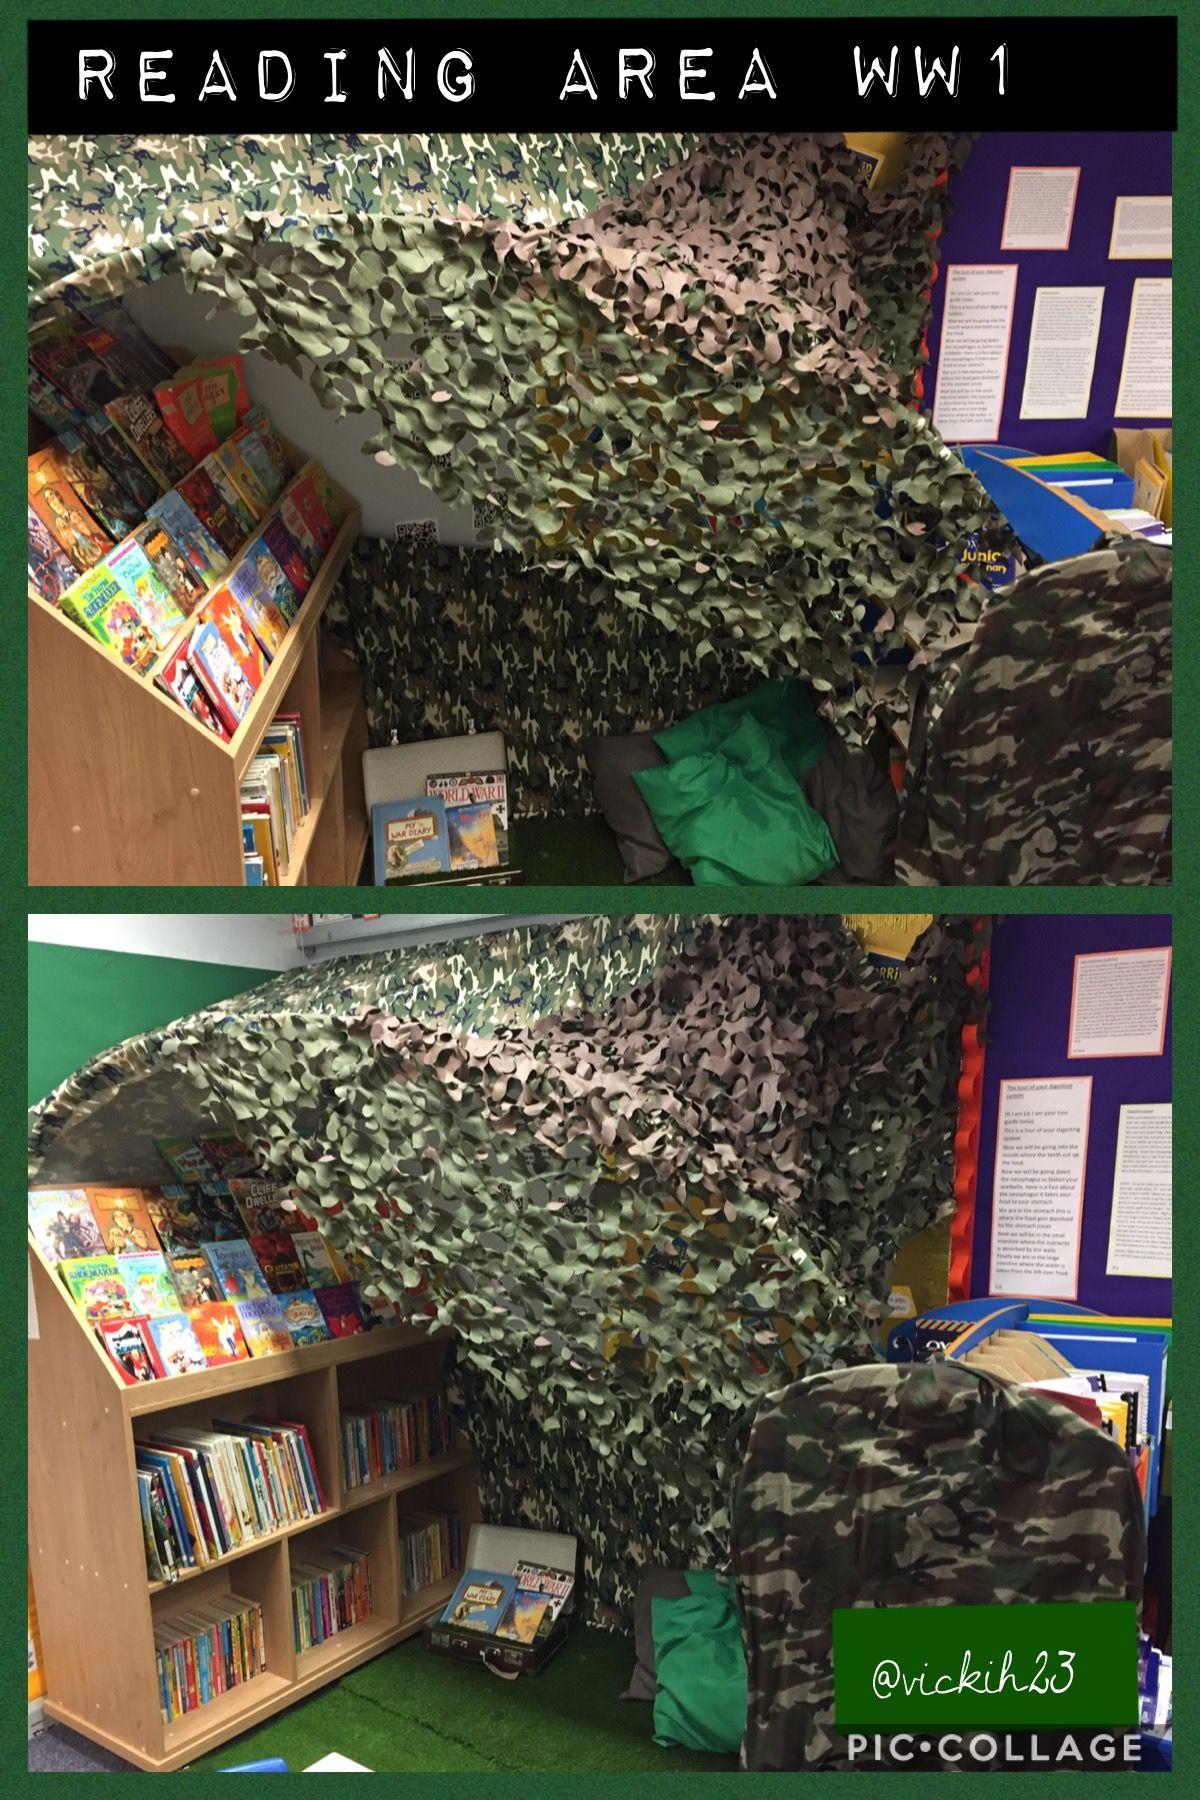 World War 1 Themed Reading Area Readingarea Ks2 Ww1